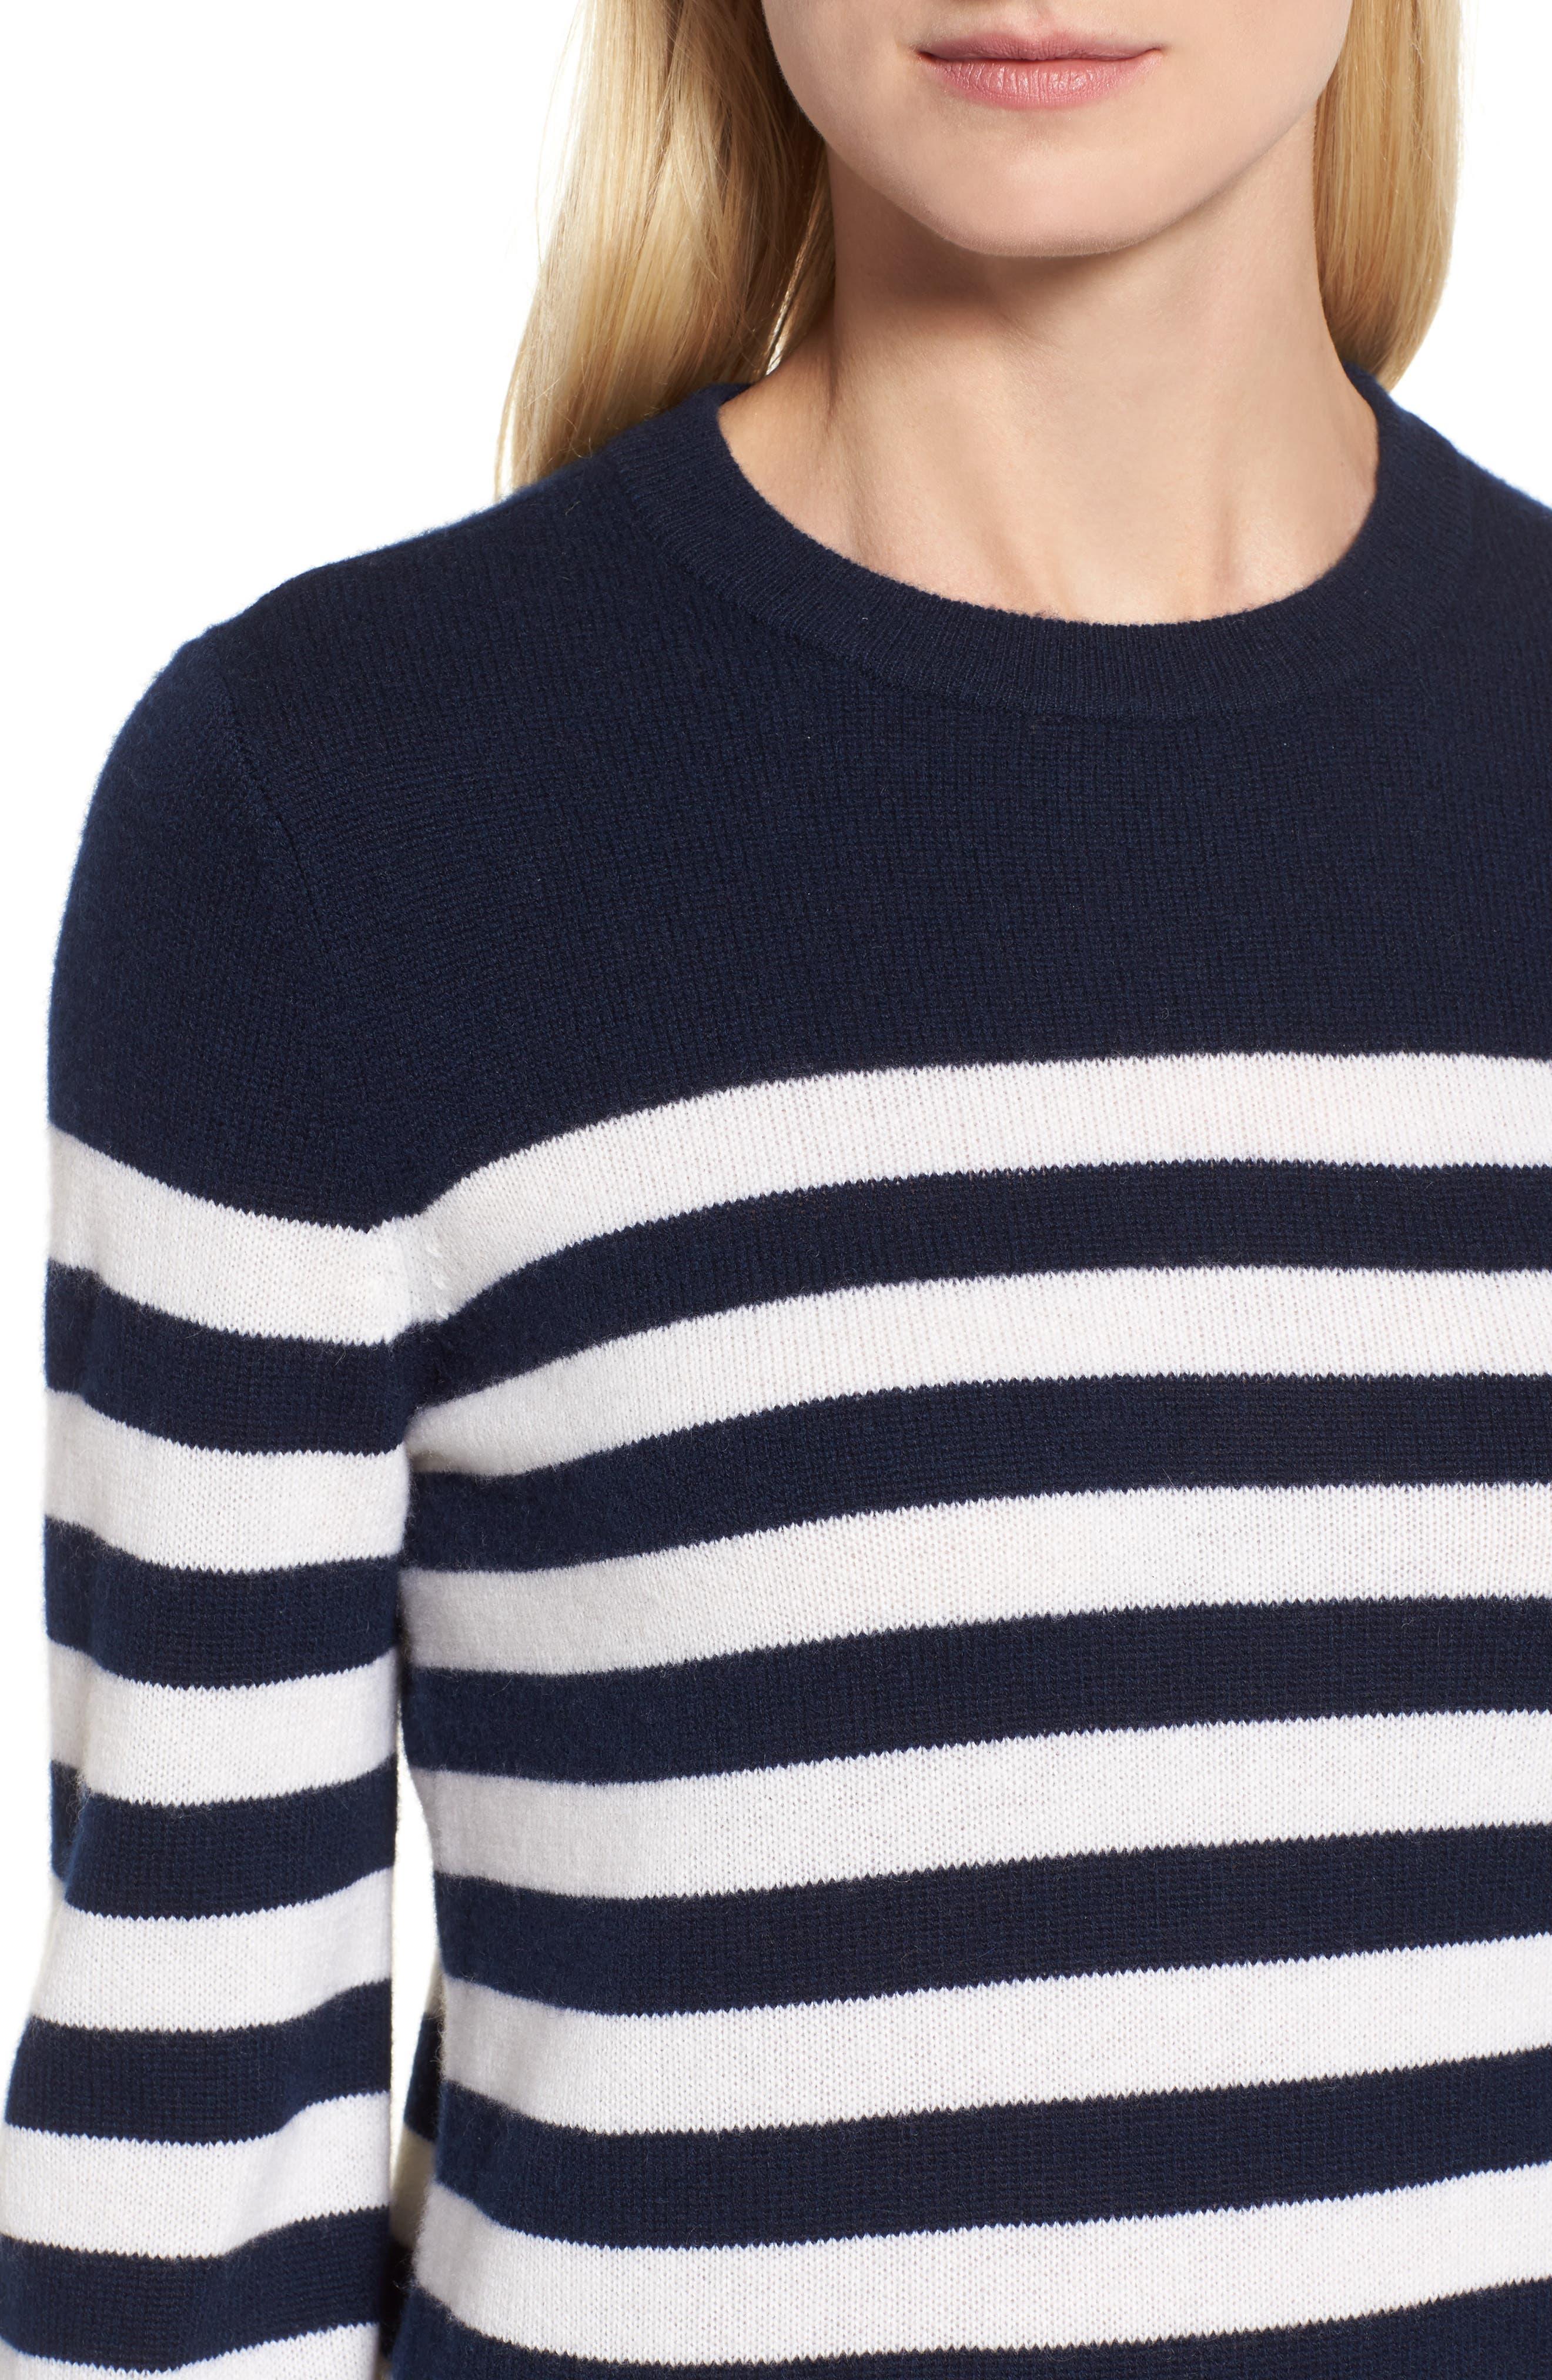 Stripe Cashmere Sweater,                             Alternate thumbnail 4, color,                             410